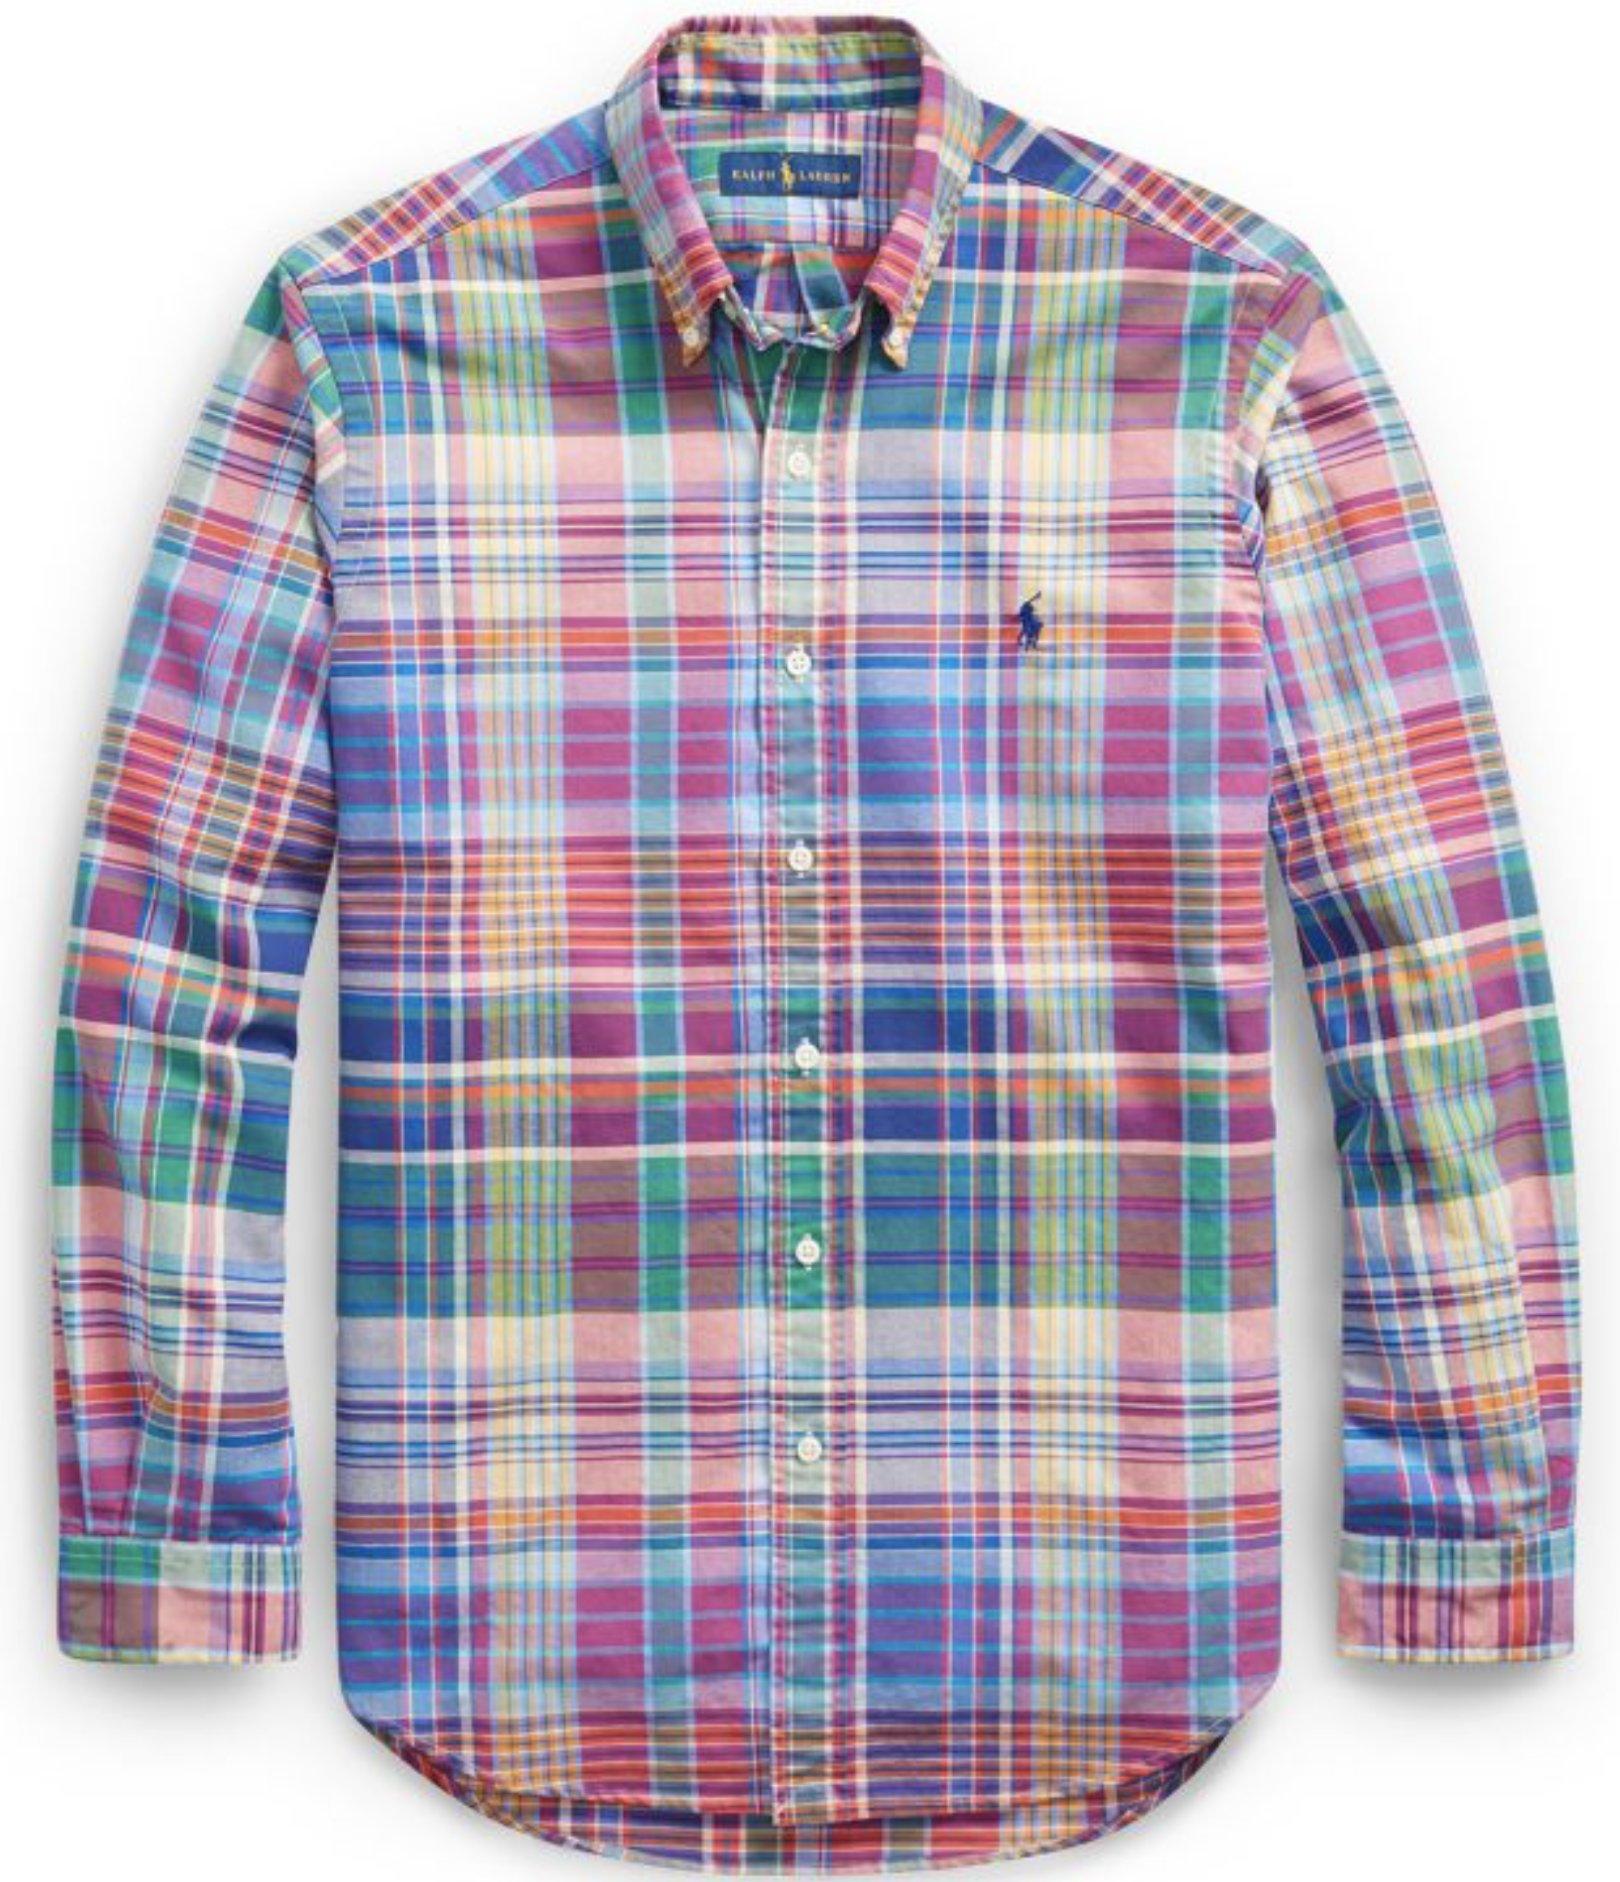 Polo Ralph Lauren Men's Long Sleeve Oxford Button Down Shirt-VenetionRuby-M